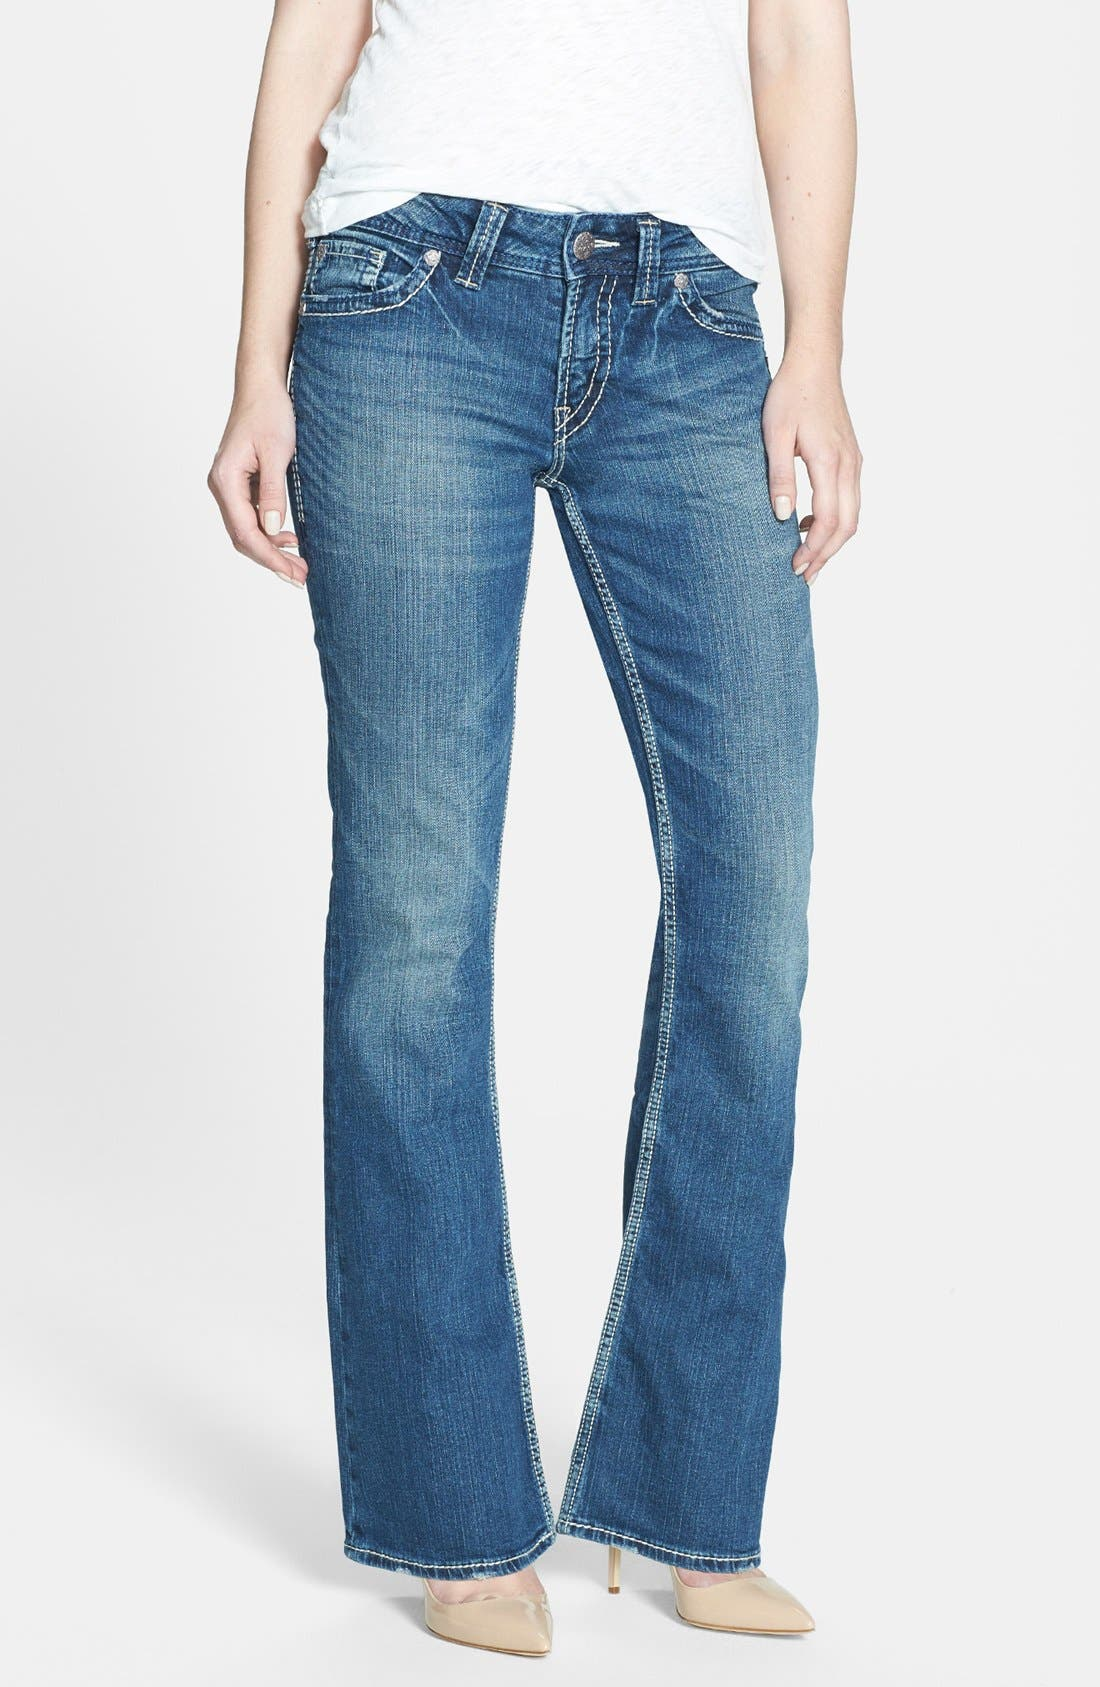 Main Image - Silver Jeans Co. 'Suki' Stretch Bootcut Jeans (Indigo)